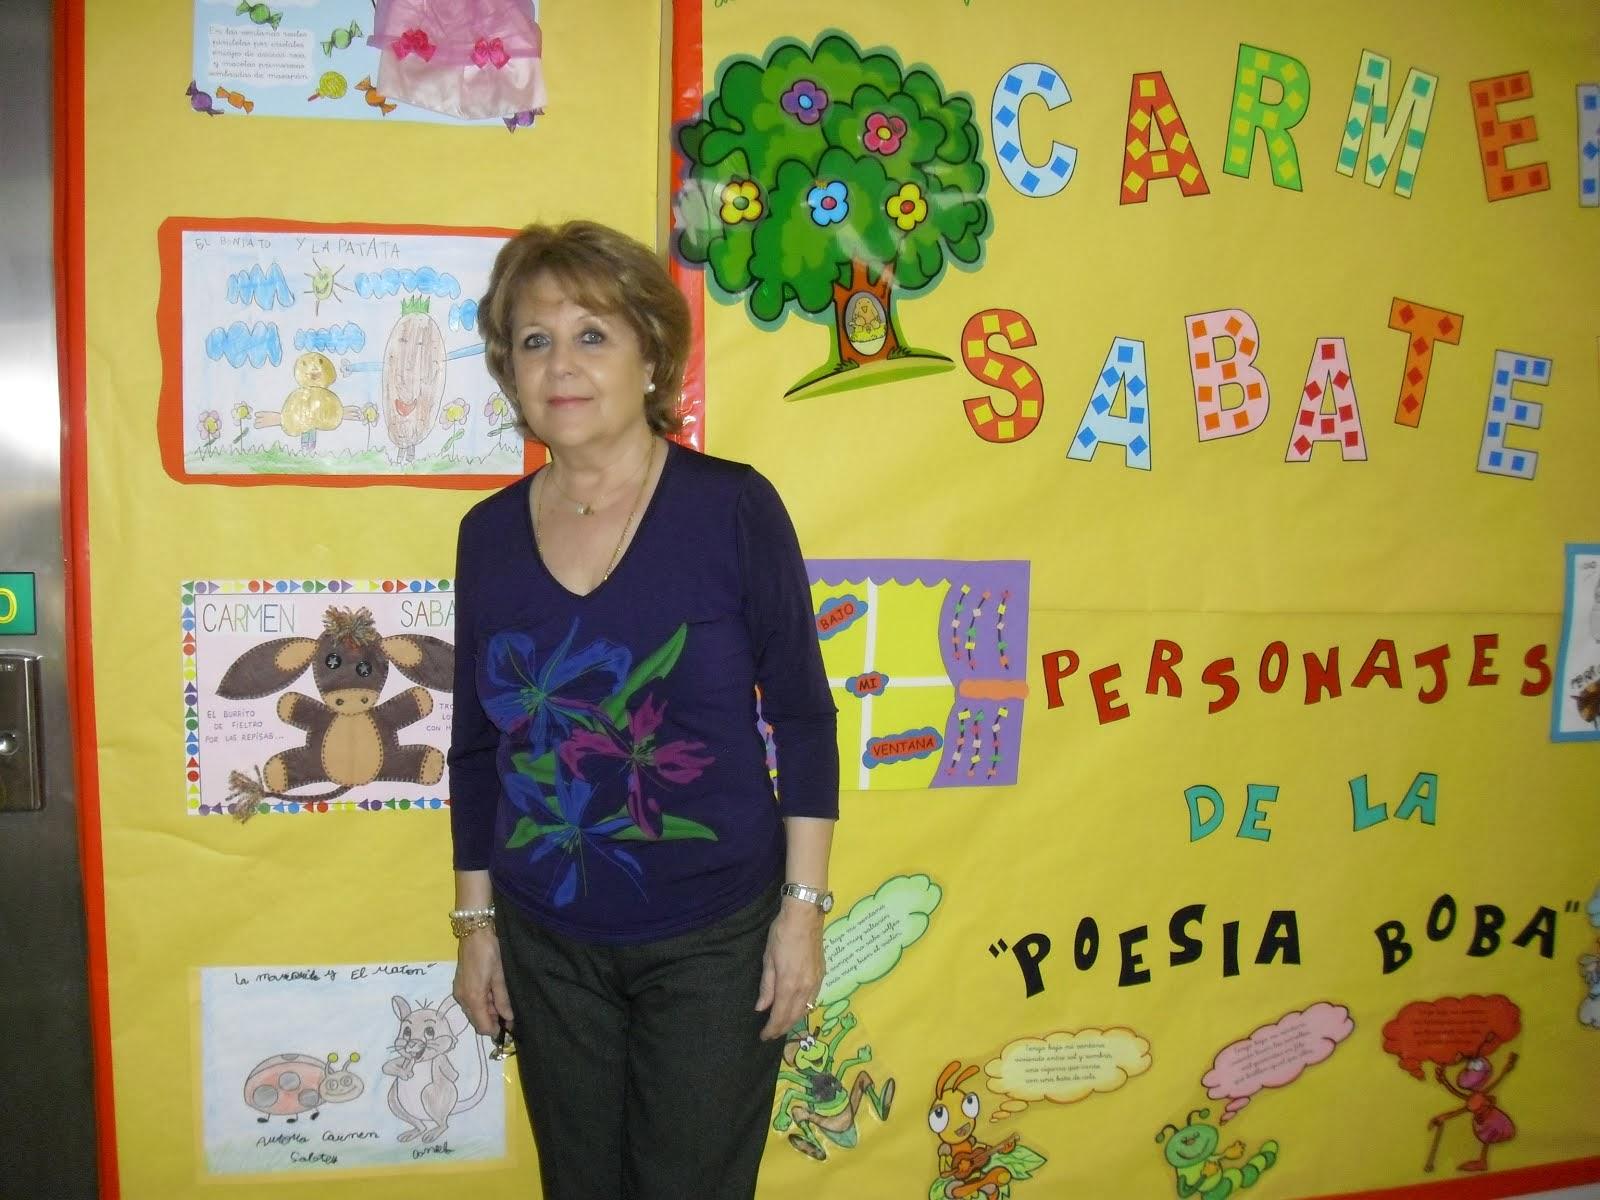 Presentando Poesía Boba